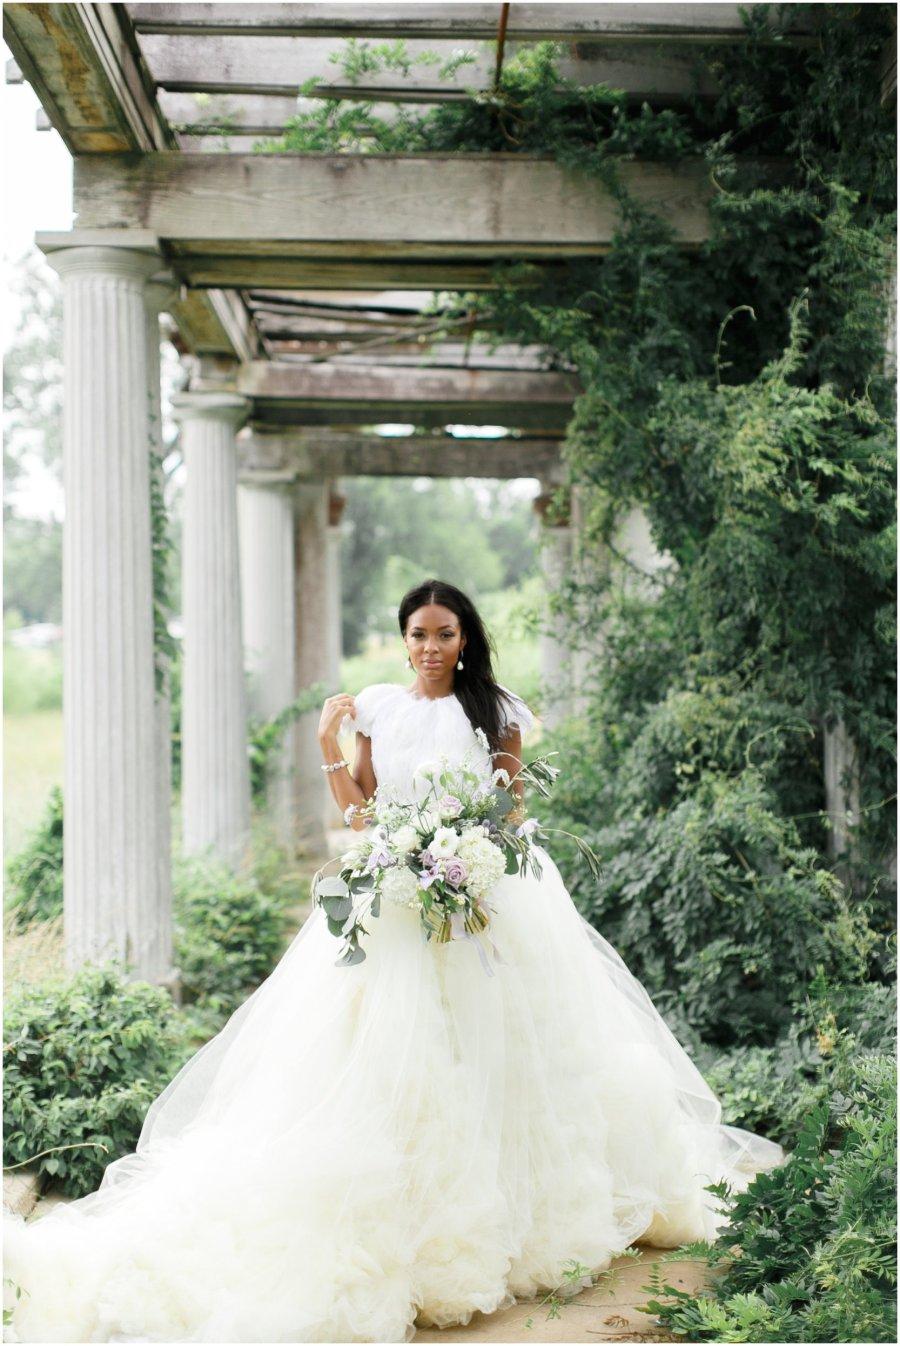 European Romance by Alea Lovely Photography + Victorian Gardens Floral Design